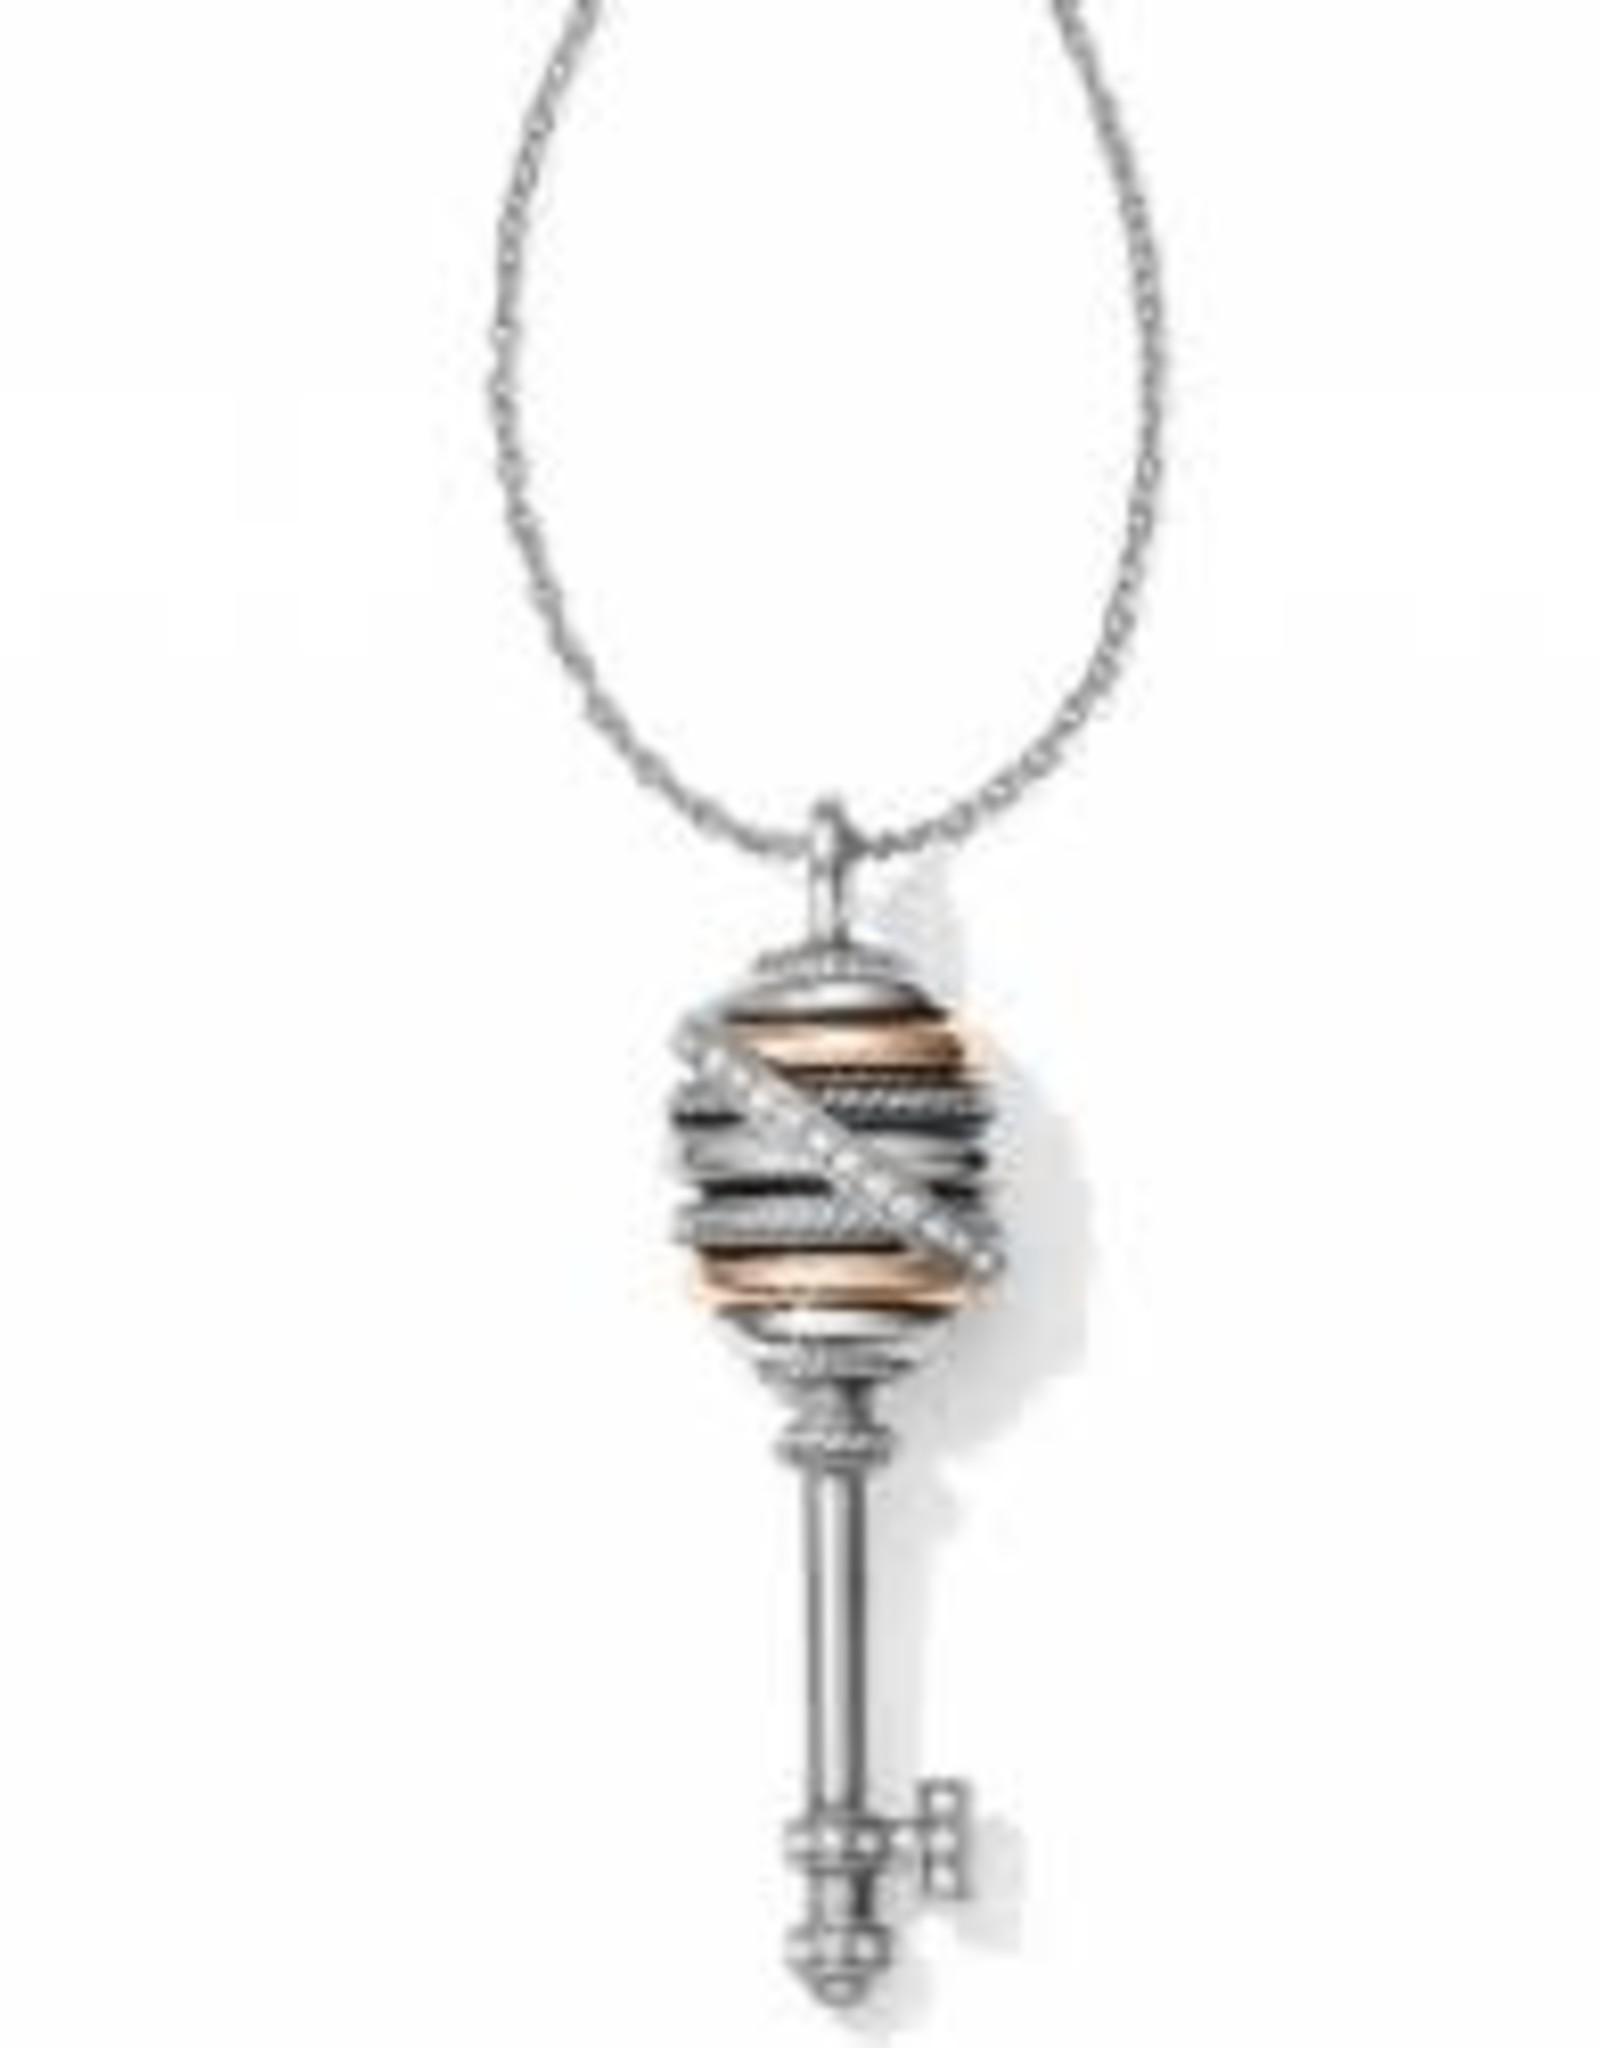 Brighton BrightonNeptune's Rings Key Necklace